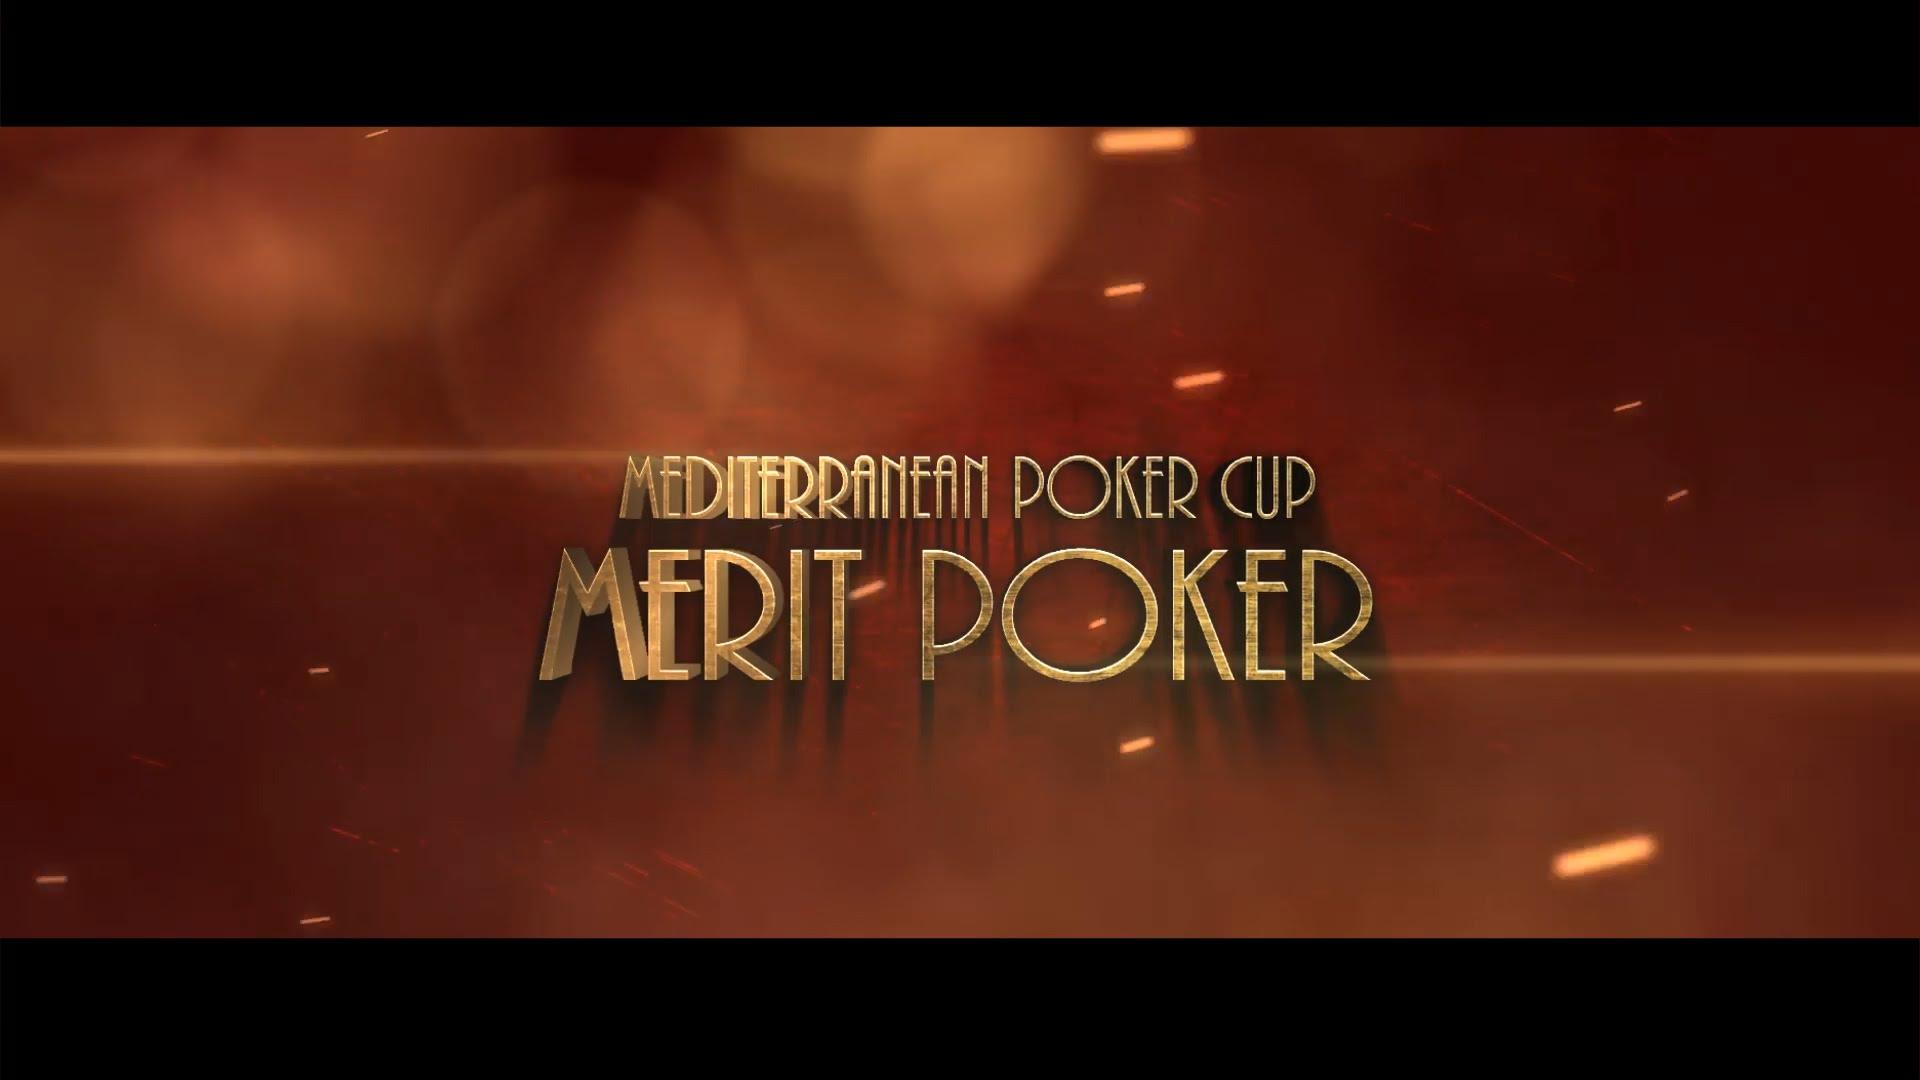 MEDITERRANEAN POKER CUP CYPRUS MAY 2015